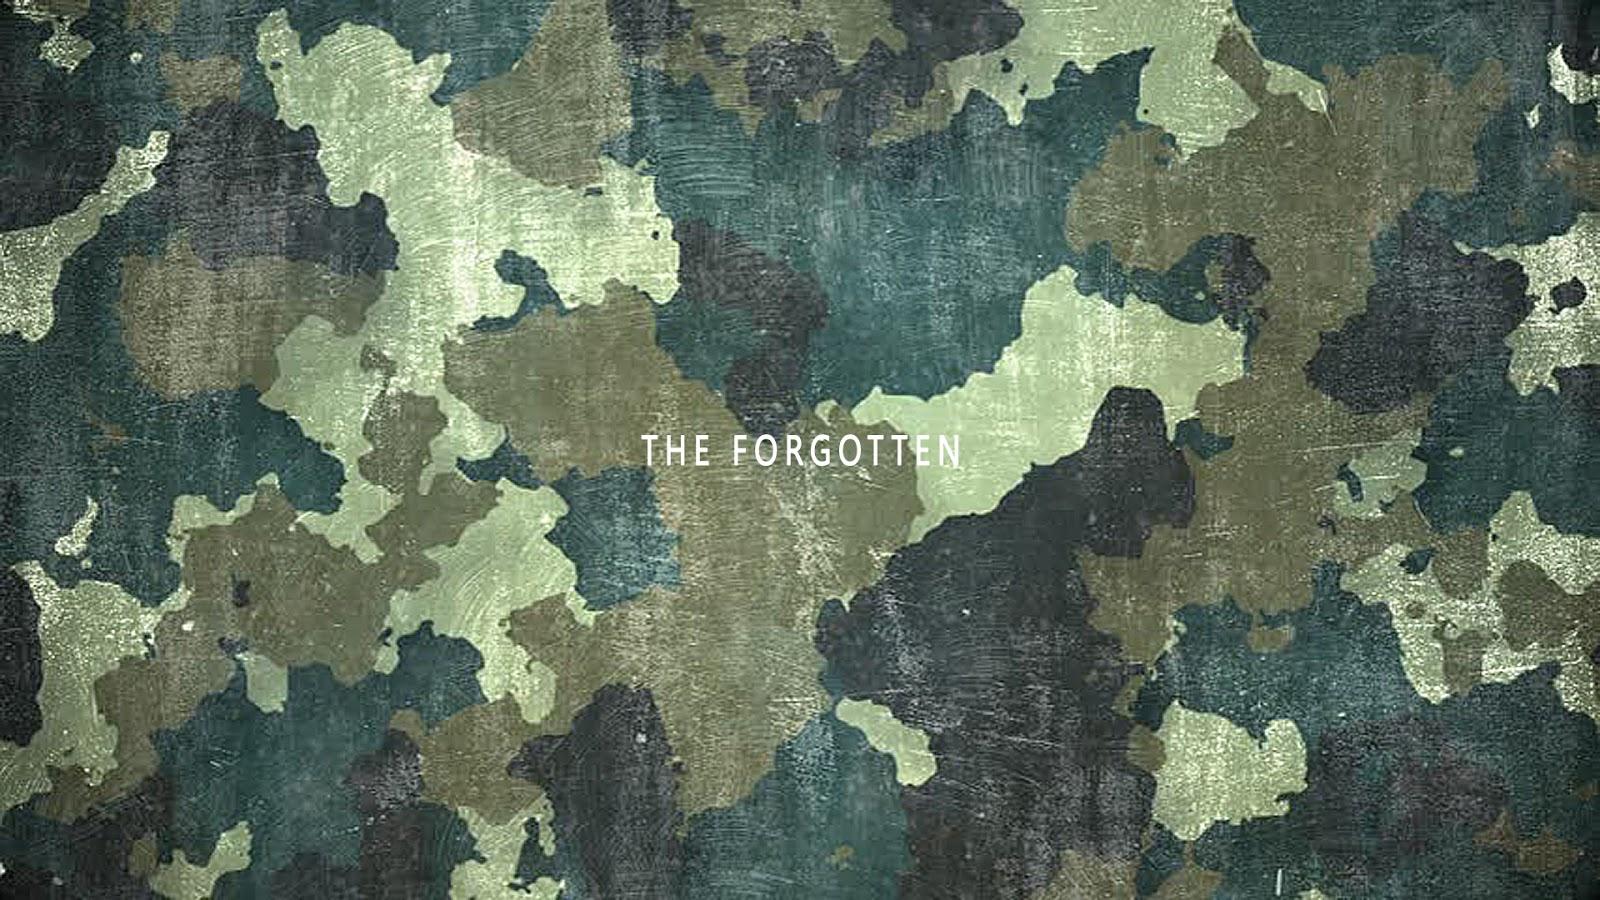 The Forgotten (Short Film)